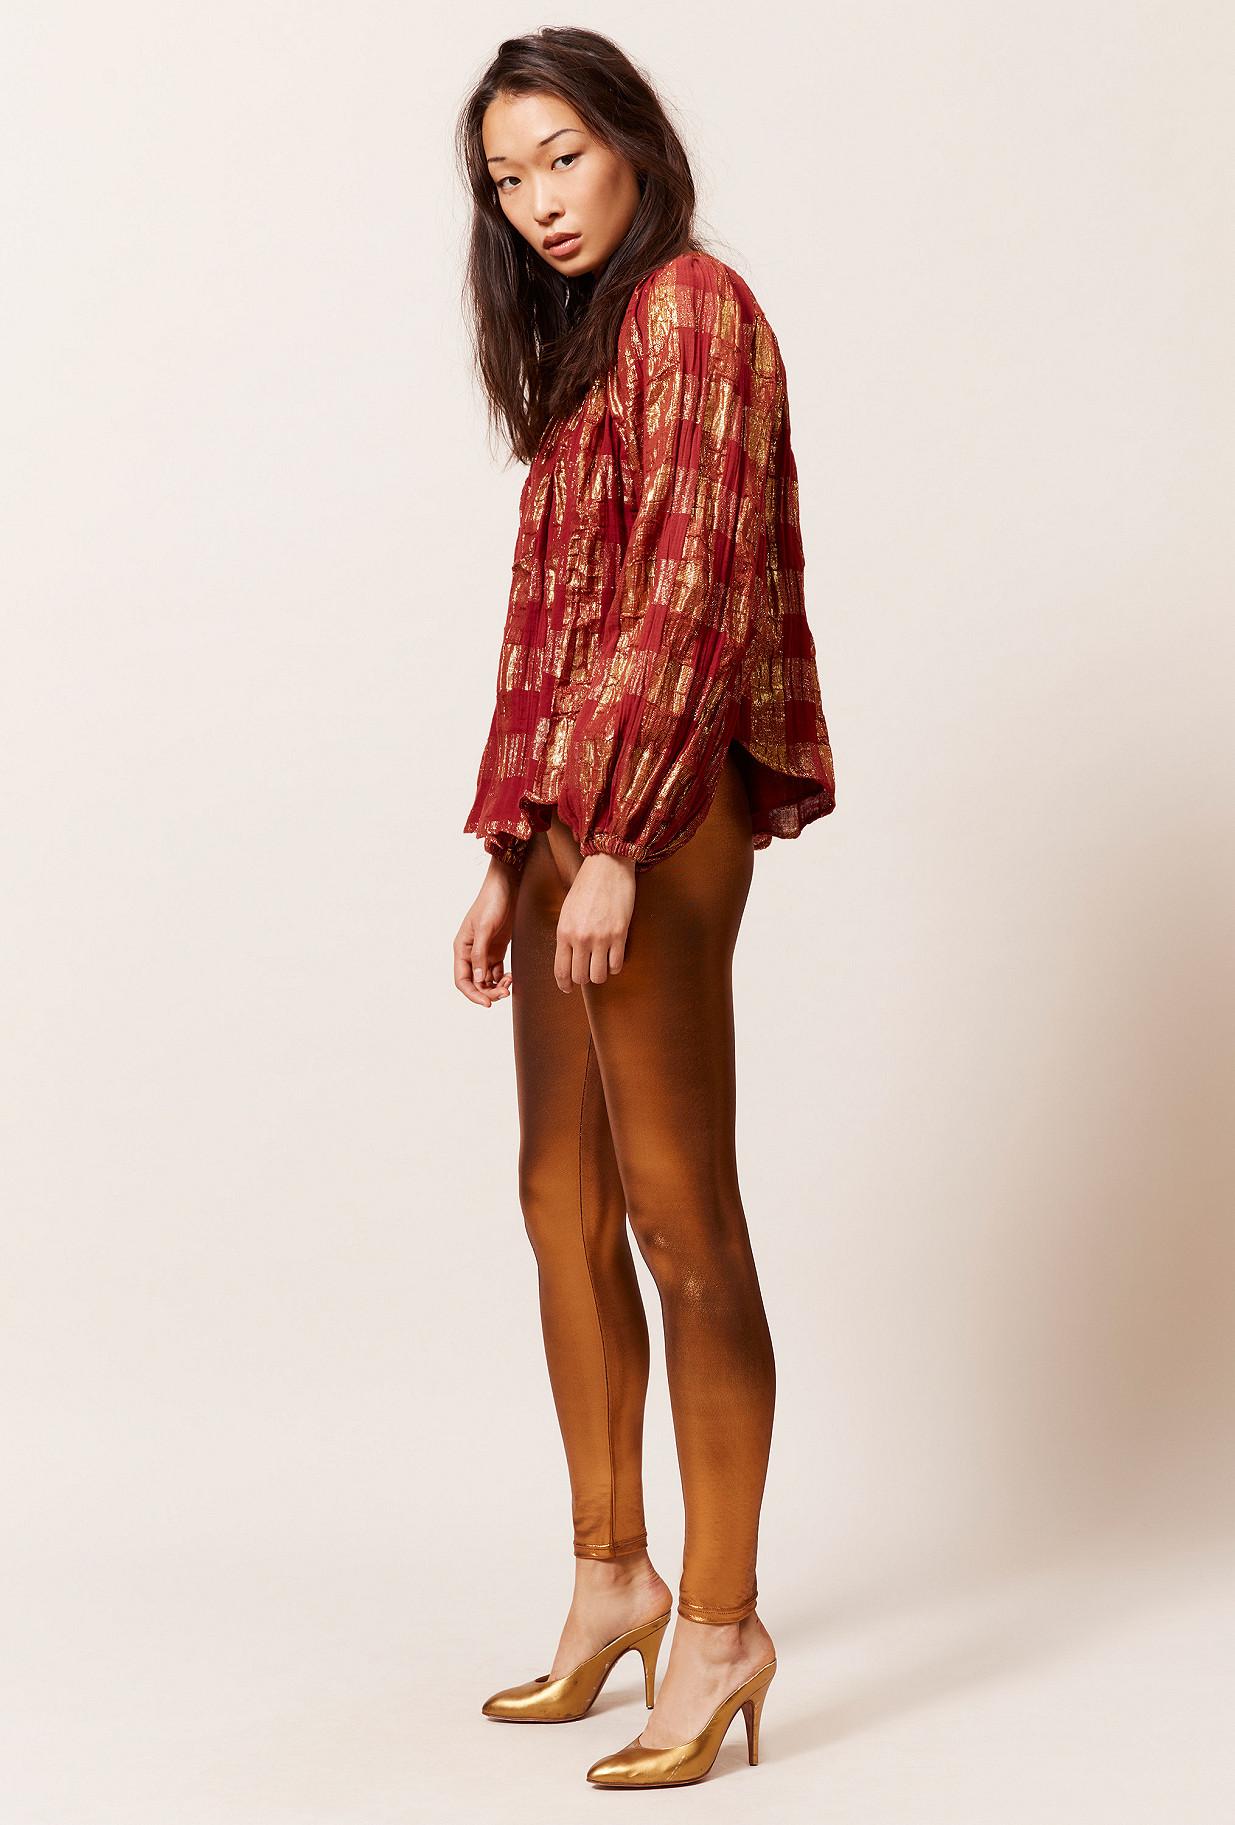 clothes store Blouse  Blouse Mojdeh 90%co 10%mtf Pes(at L 100% Co) french designer fashion Paris